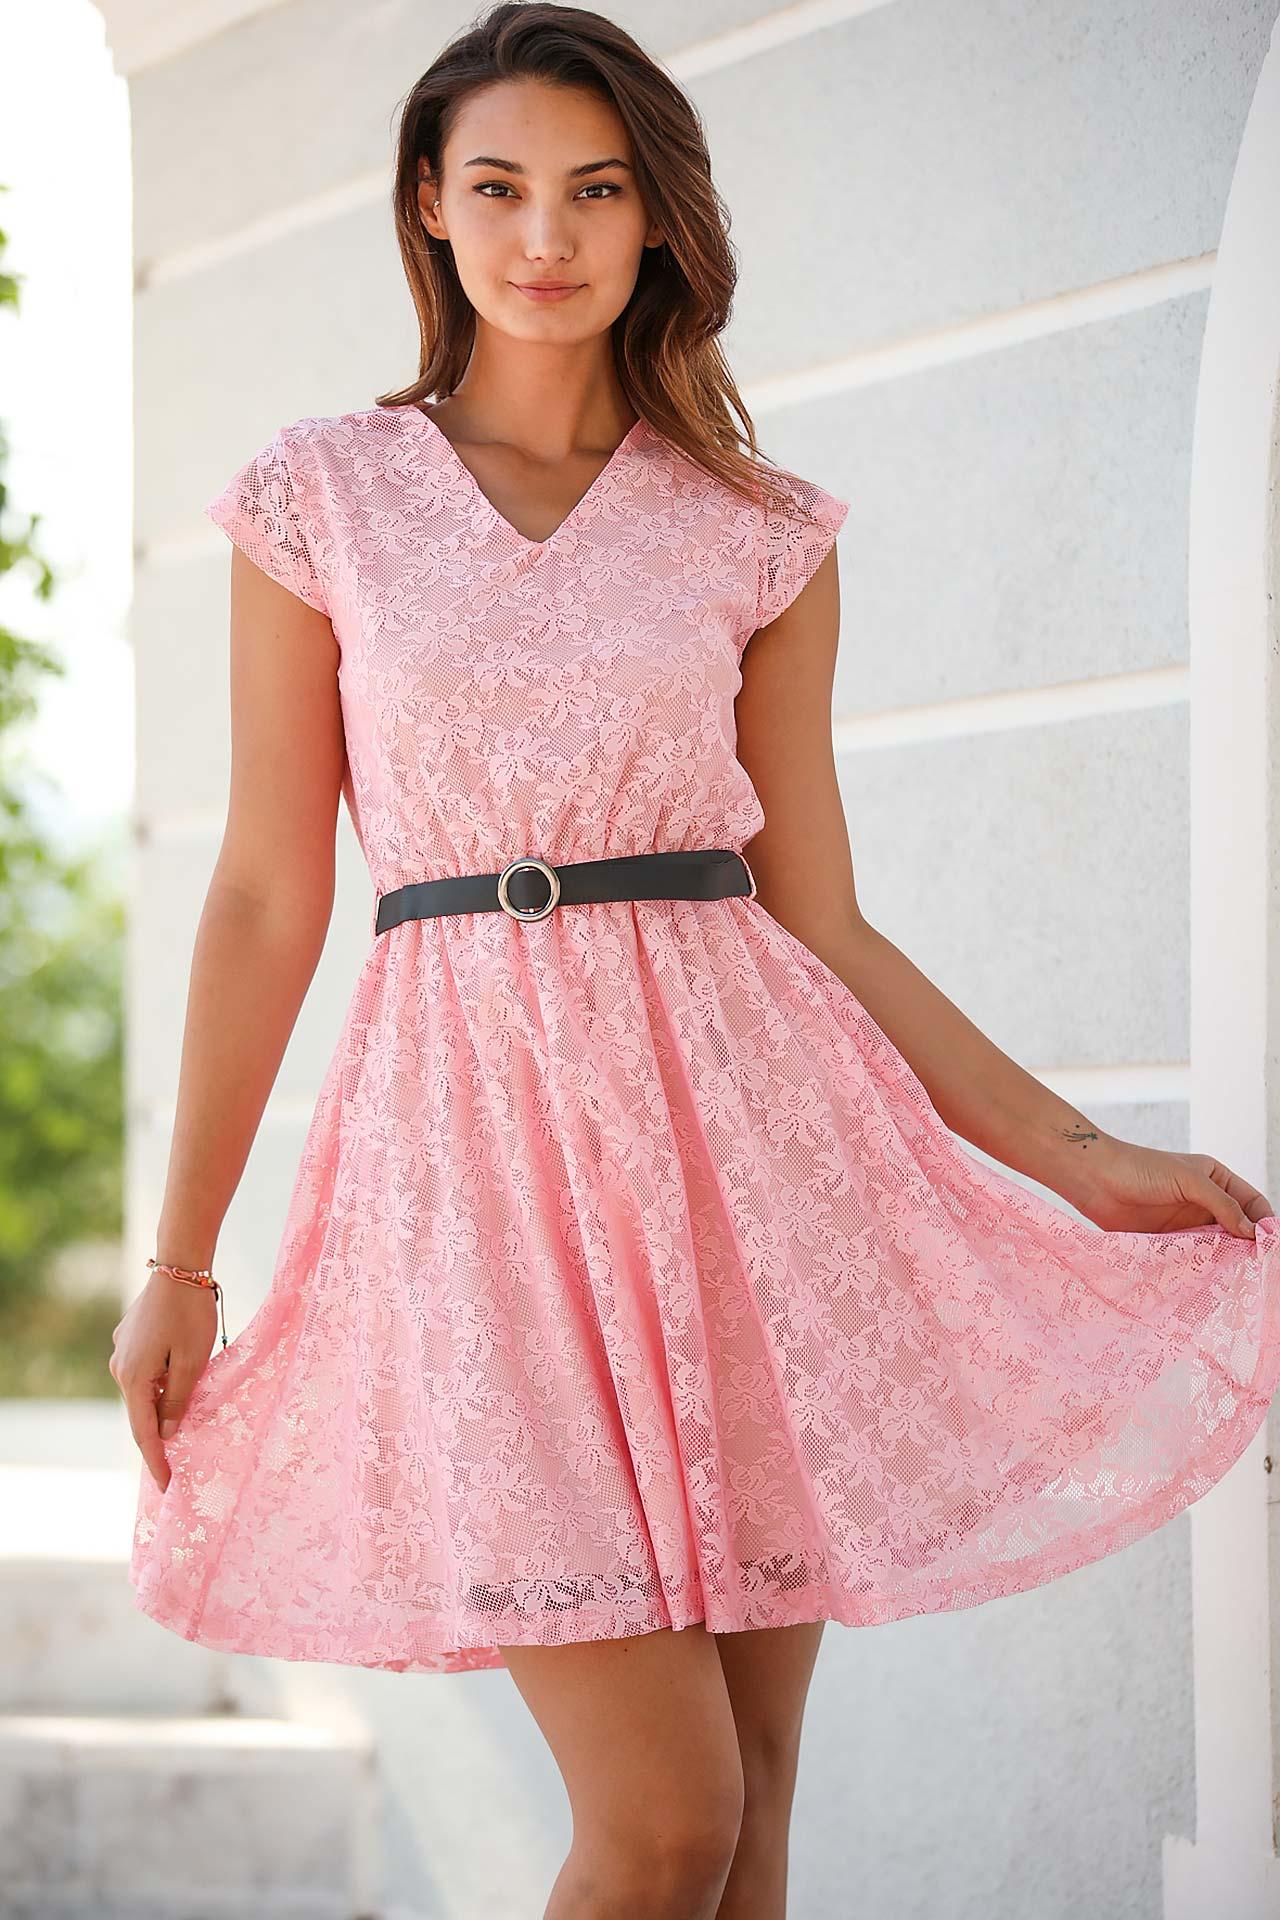 Women's Short Pink Lace Dress